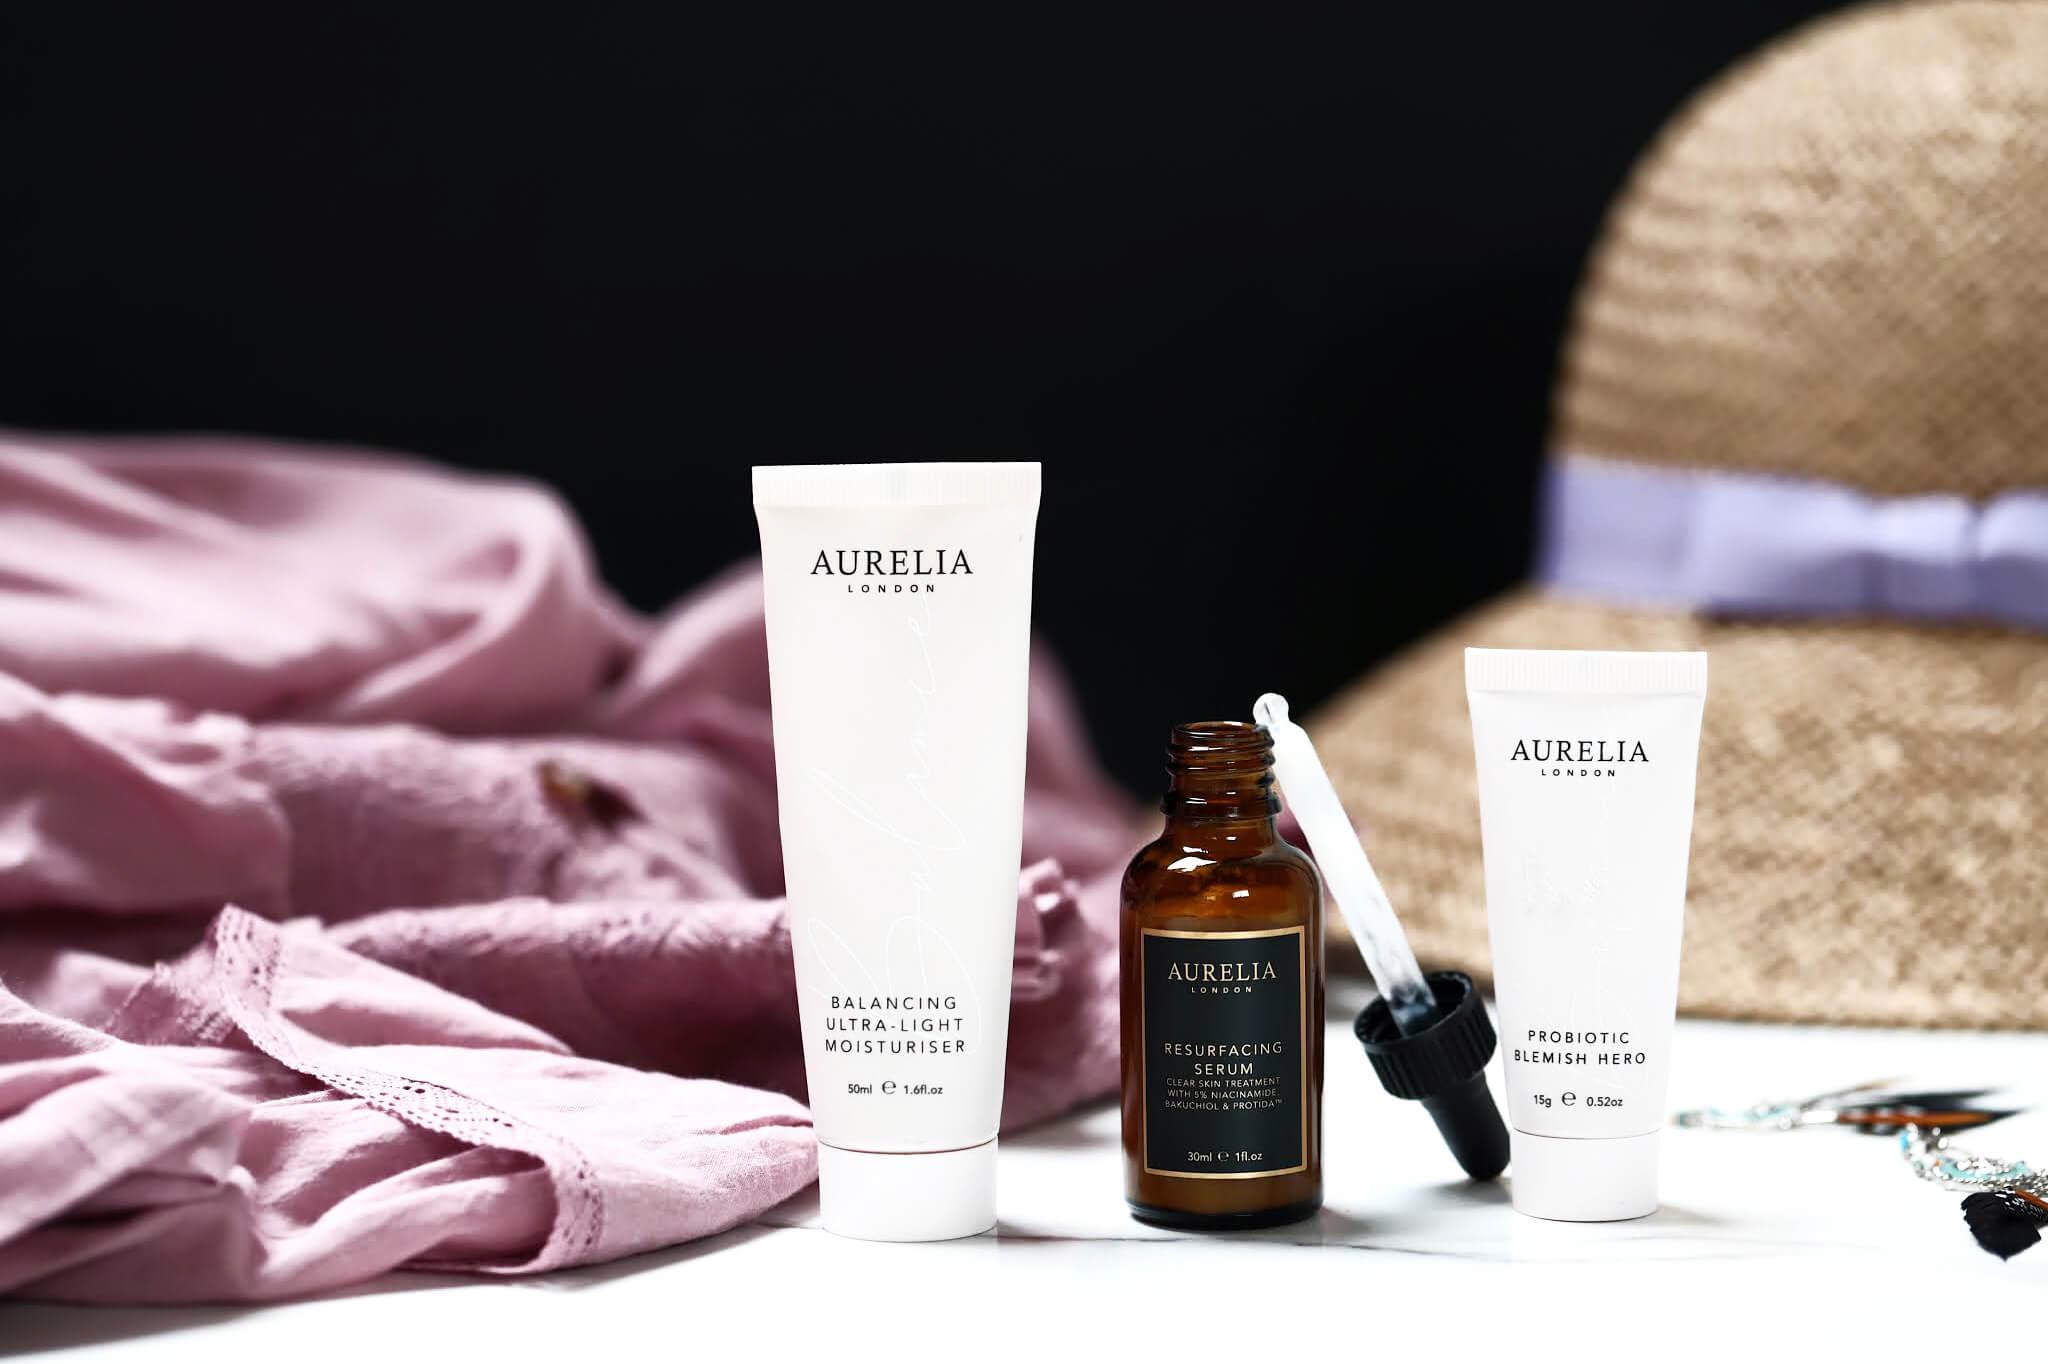 Aurelia London Serum resurfacing ultra balancing crème légère blemish hero